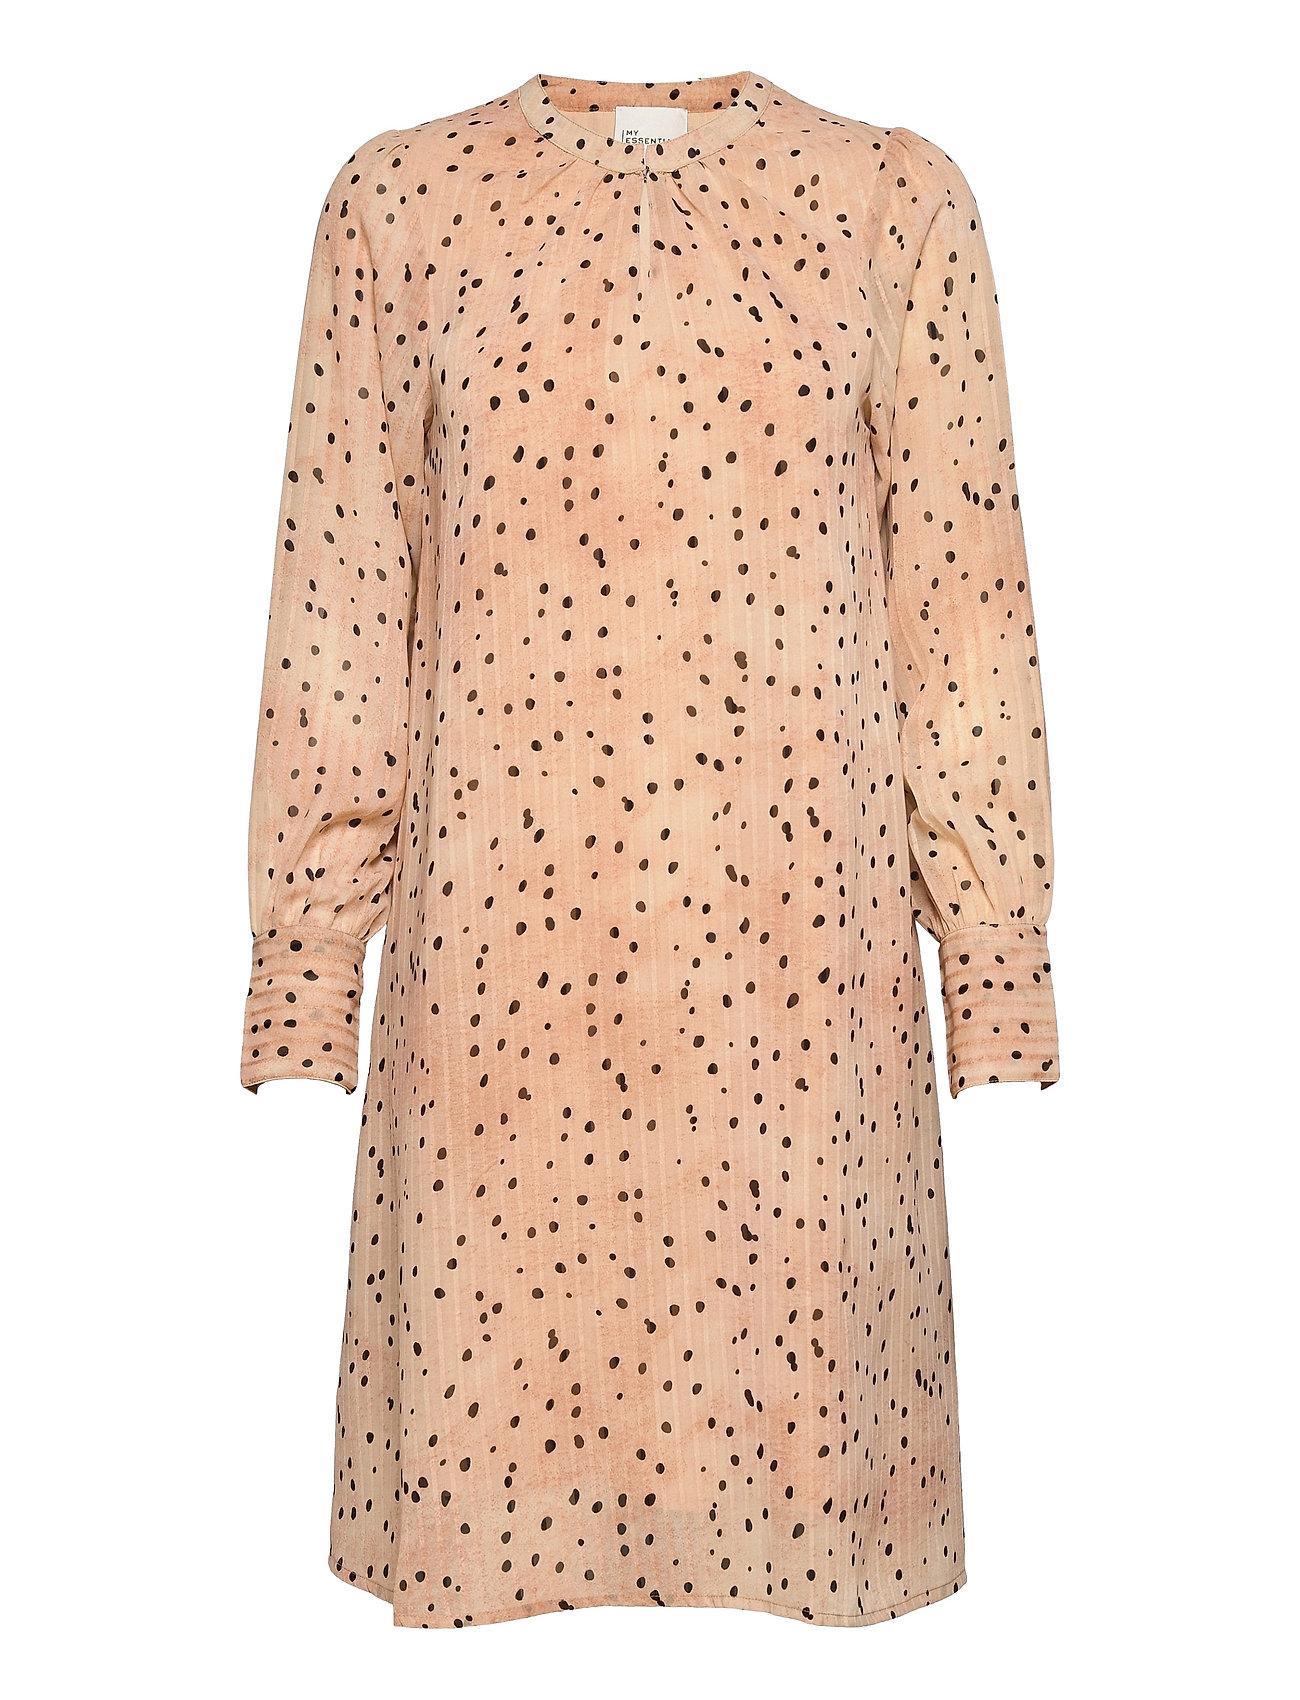 Mwprimo Dot Dress Dresses Everyday Dresses Creme My Essential Wardrobe